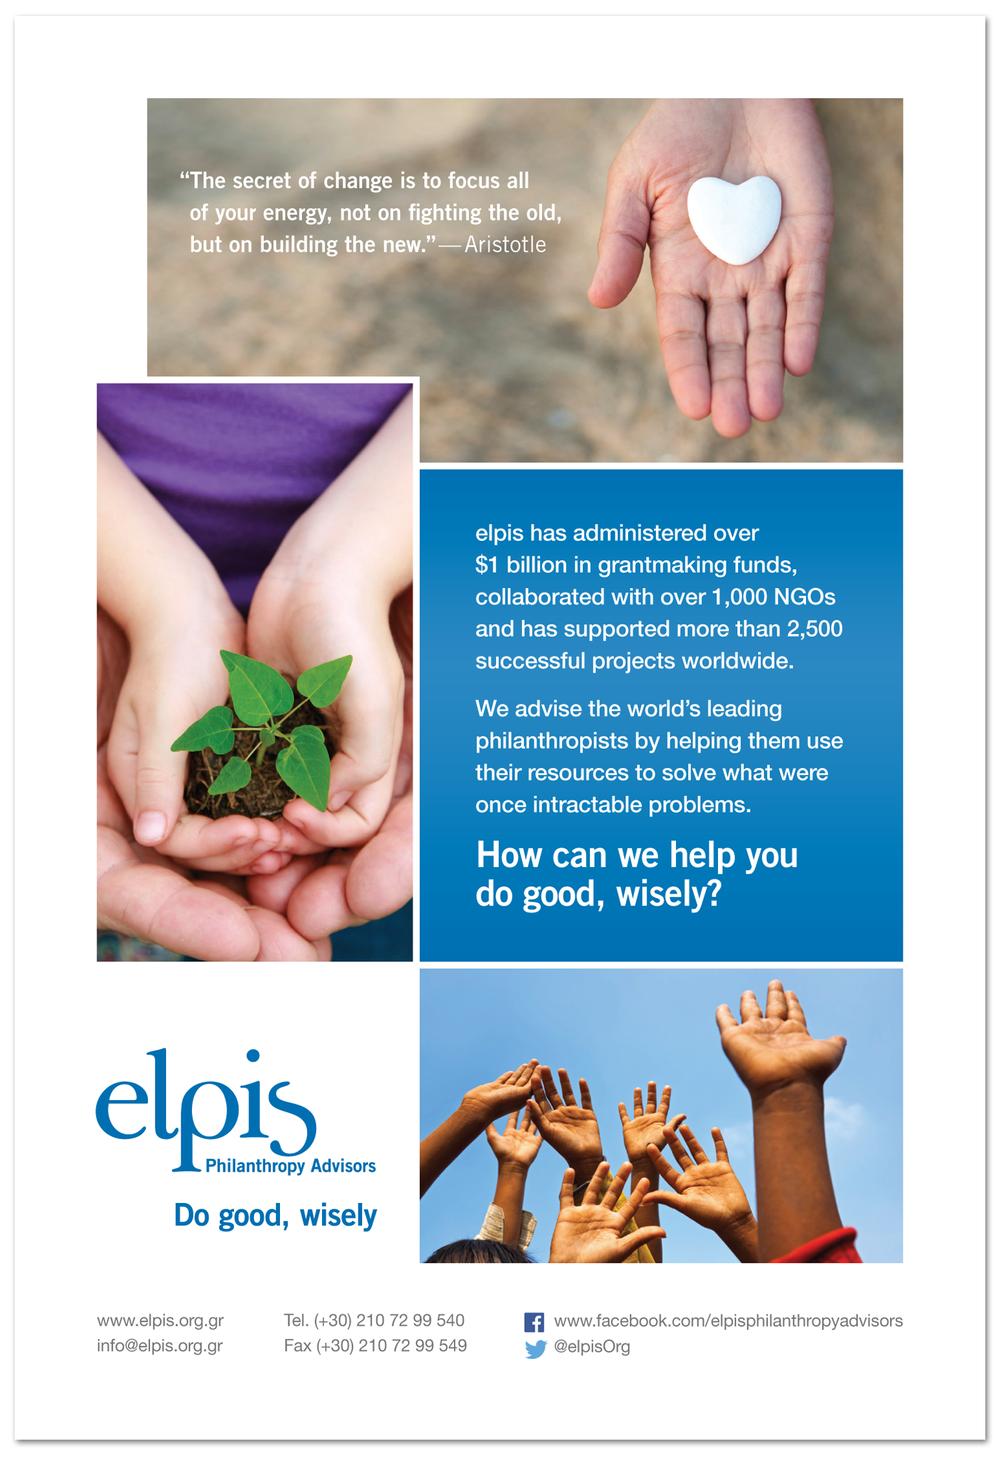 elpis_magazine_ad_v1.png